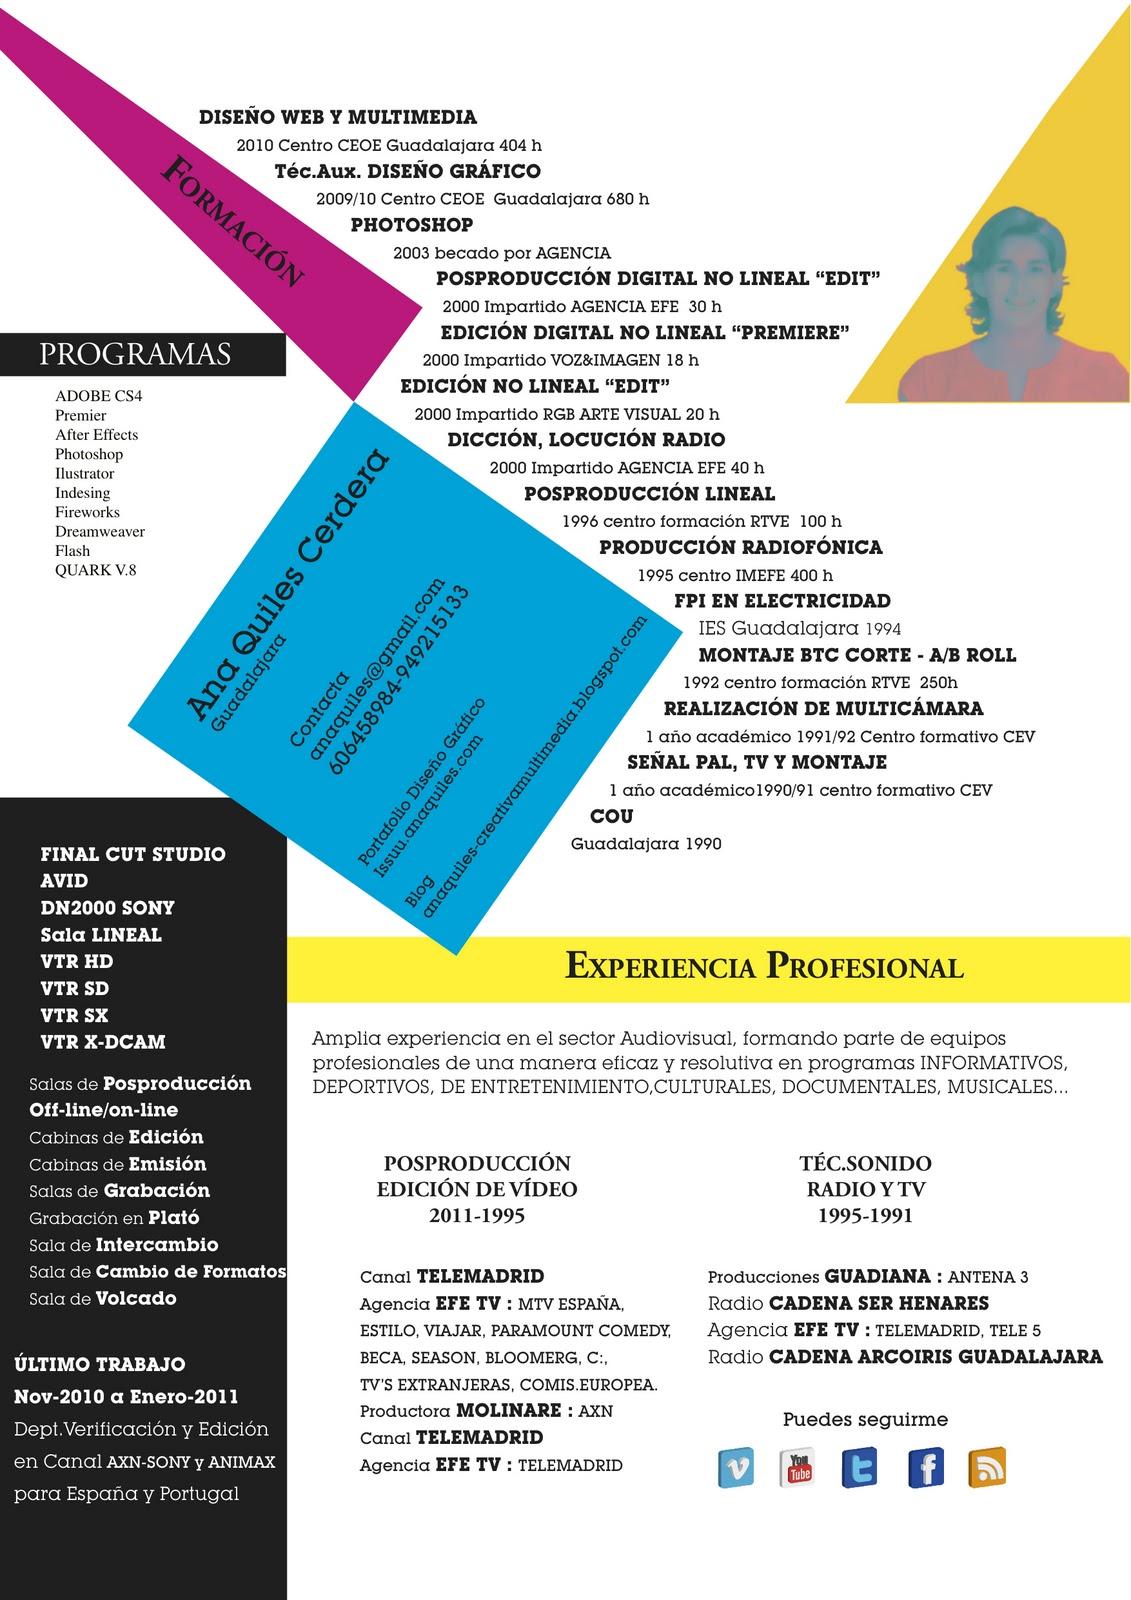 CURRÍCULUM VITAE USANDO REALIDAD AUMENTADA | CREATIVA MULTIMEDIA AQ